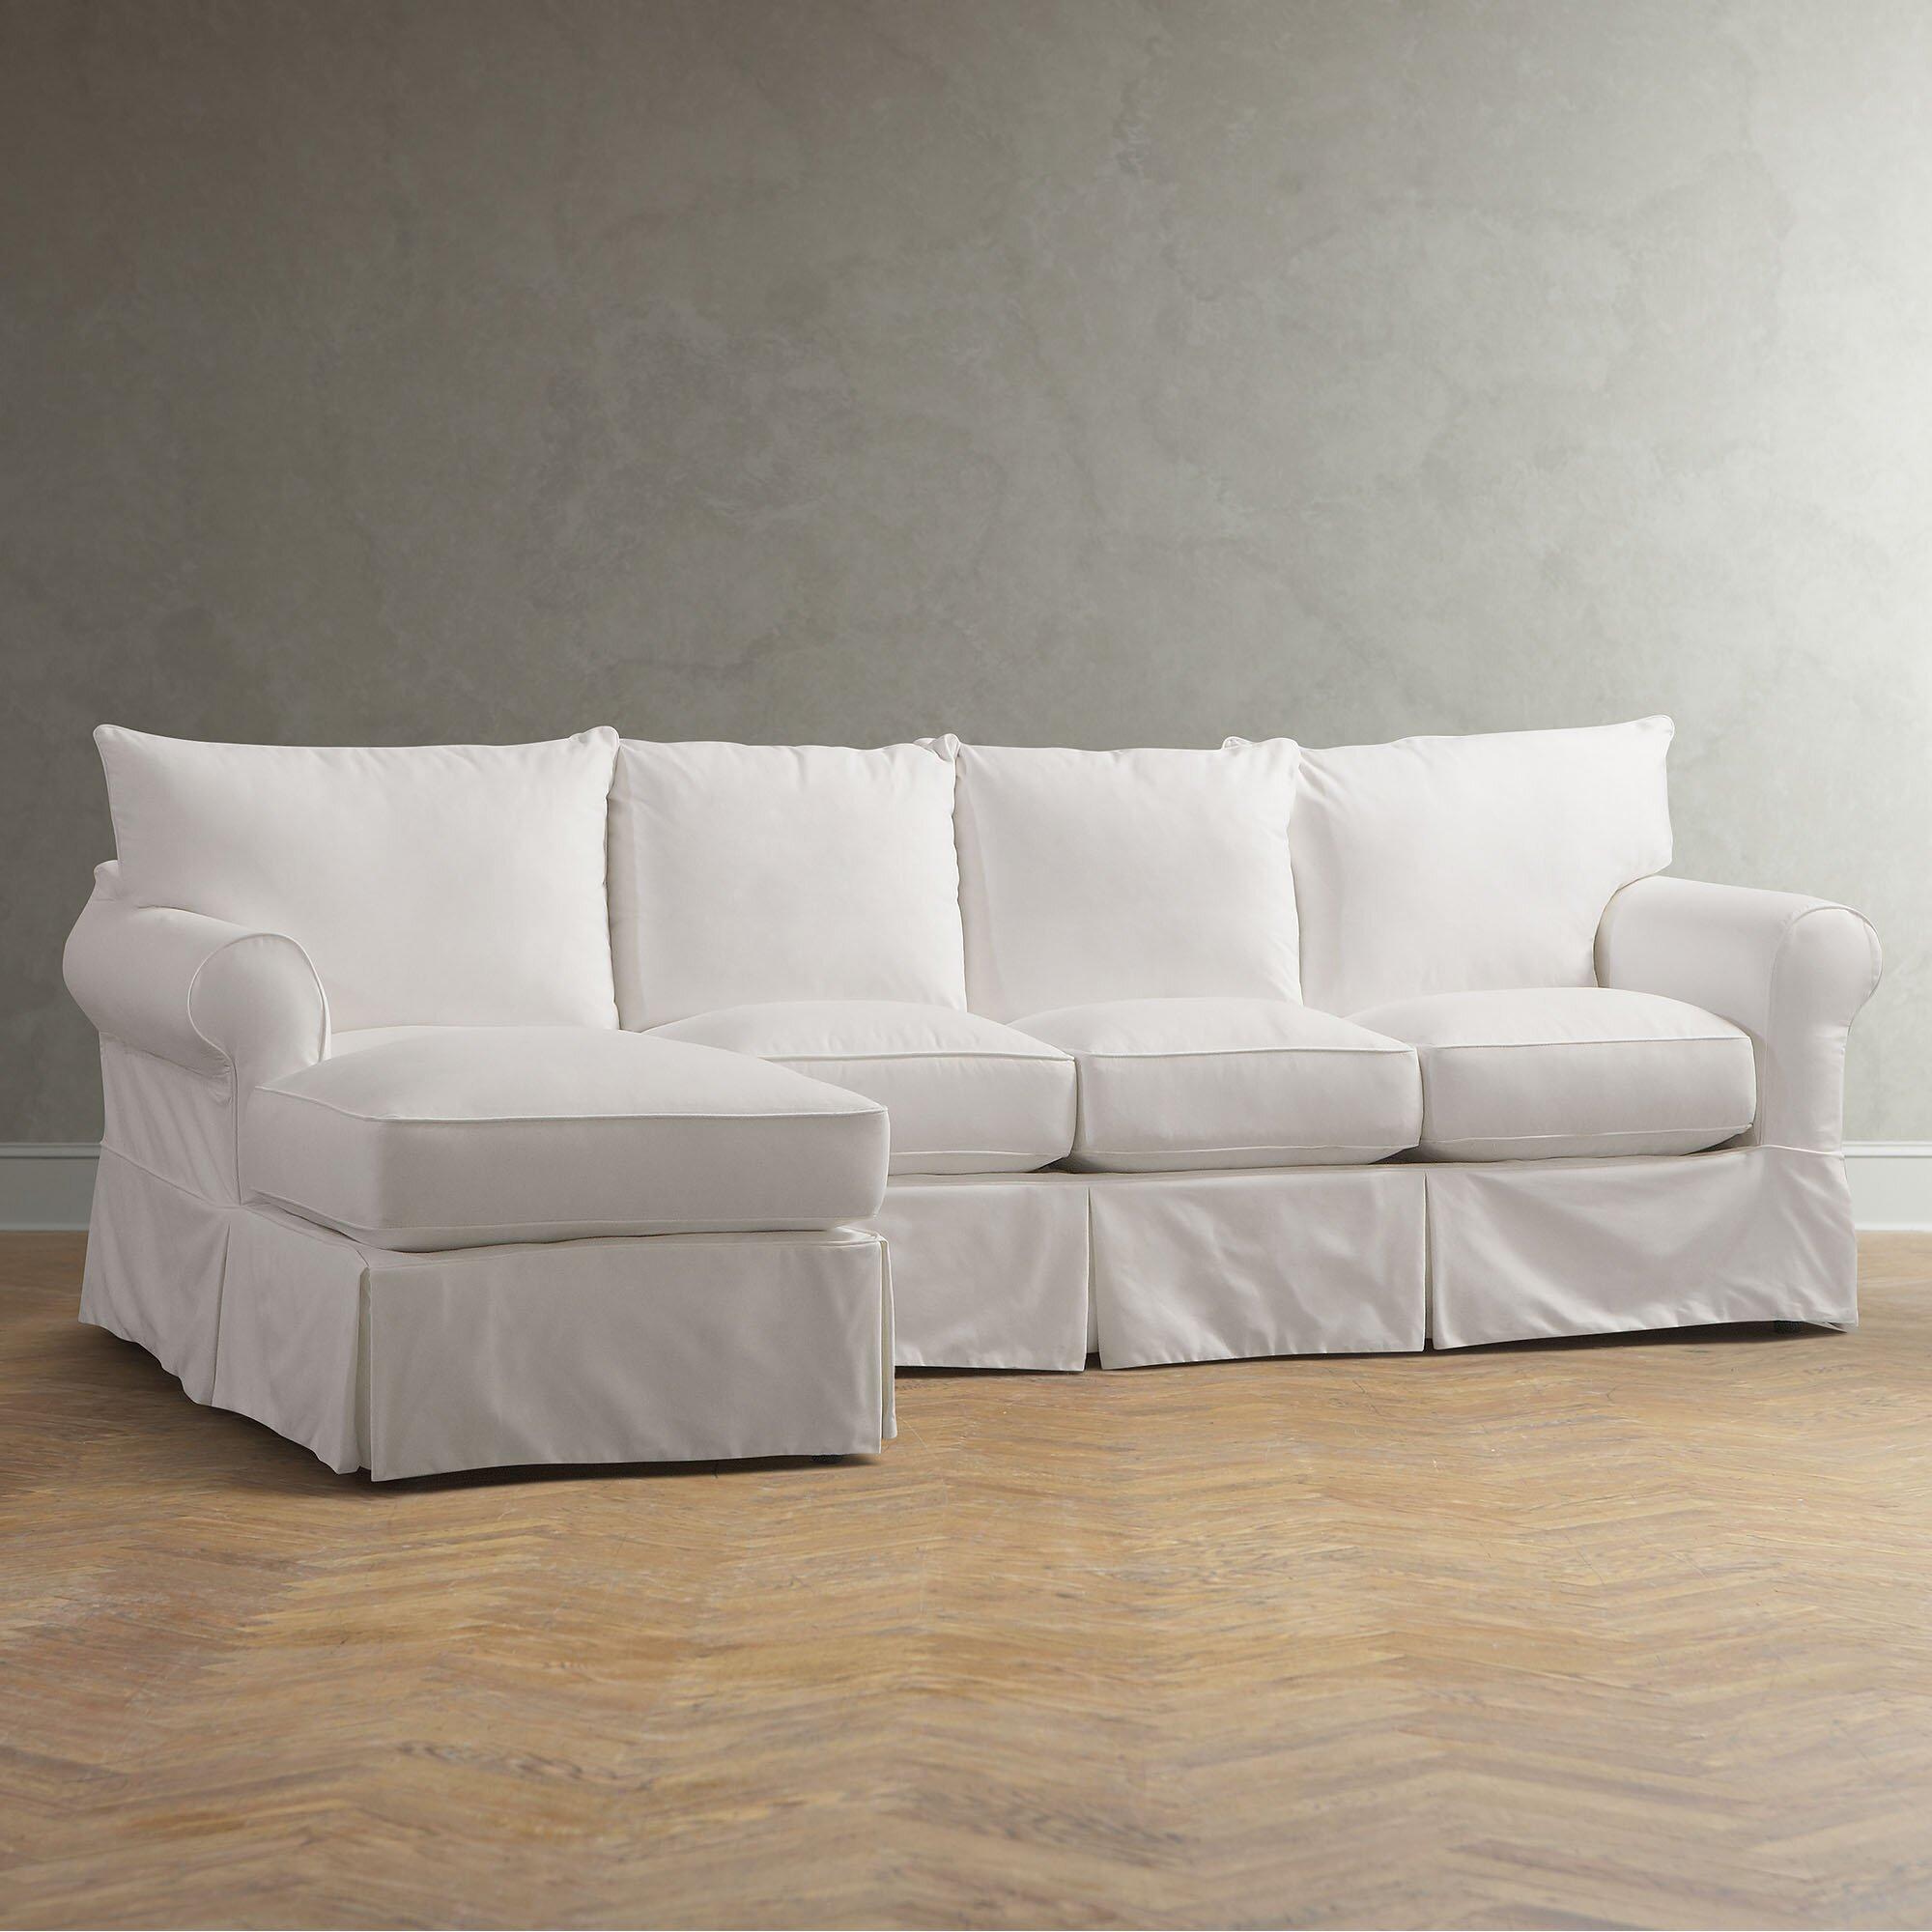 Birch lane jameson sleeper sectional reviews wayfair for Lane leather sectional sleeper sofa